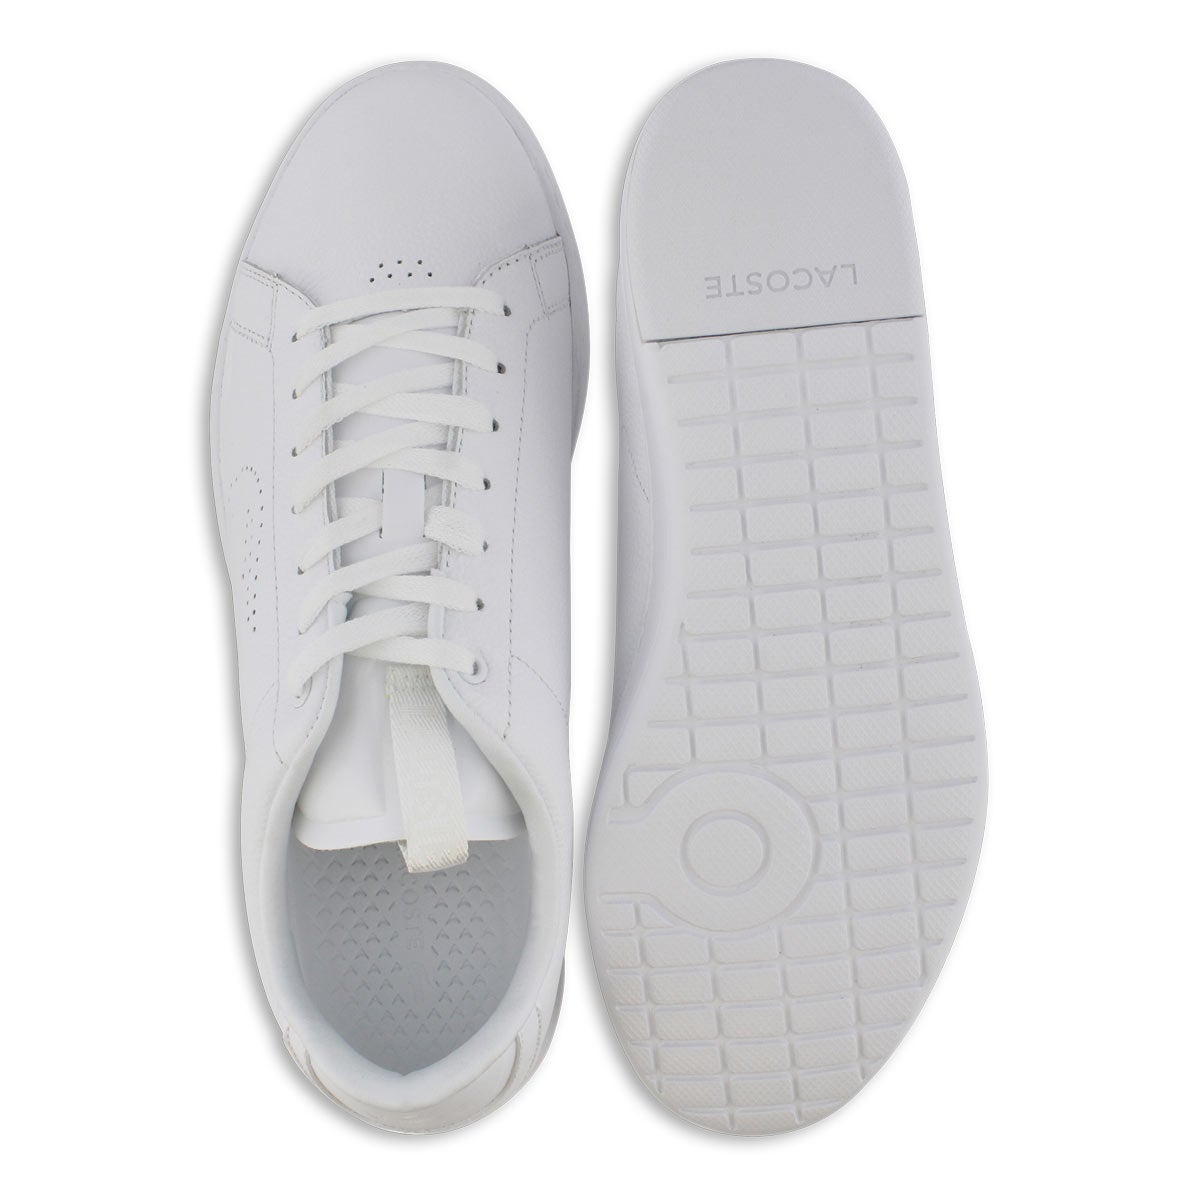 Men's Carnaby EVO 319 1 Fashion Sneaker - White